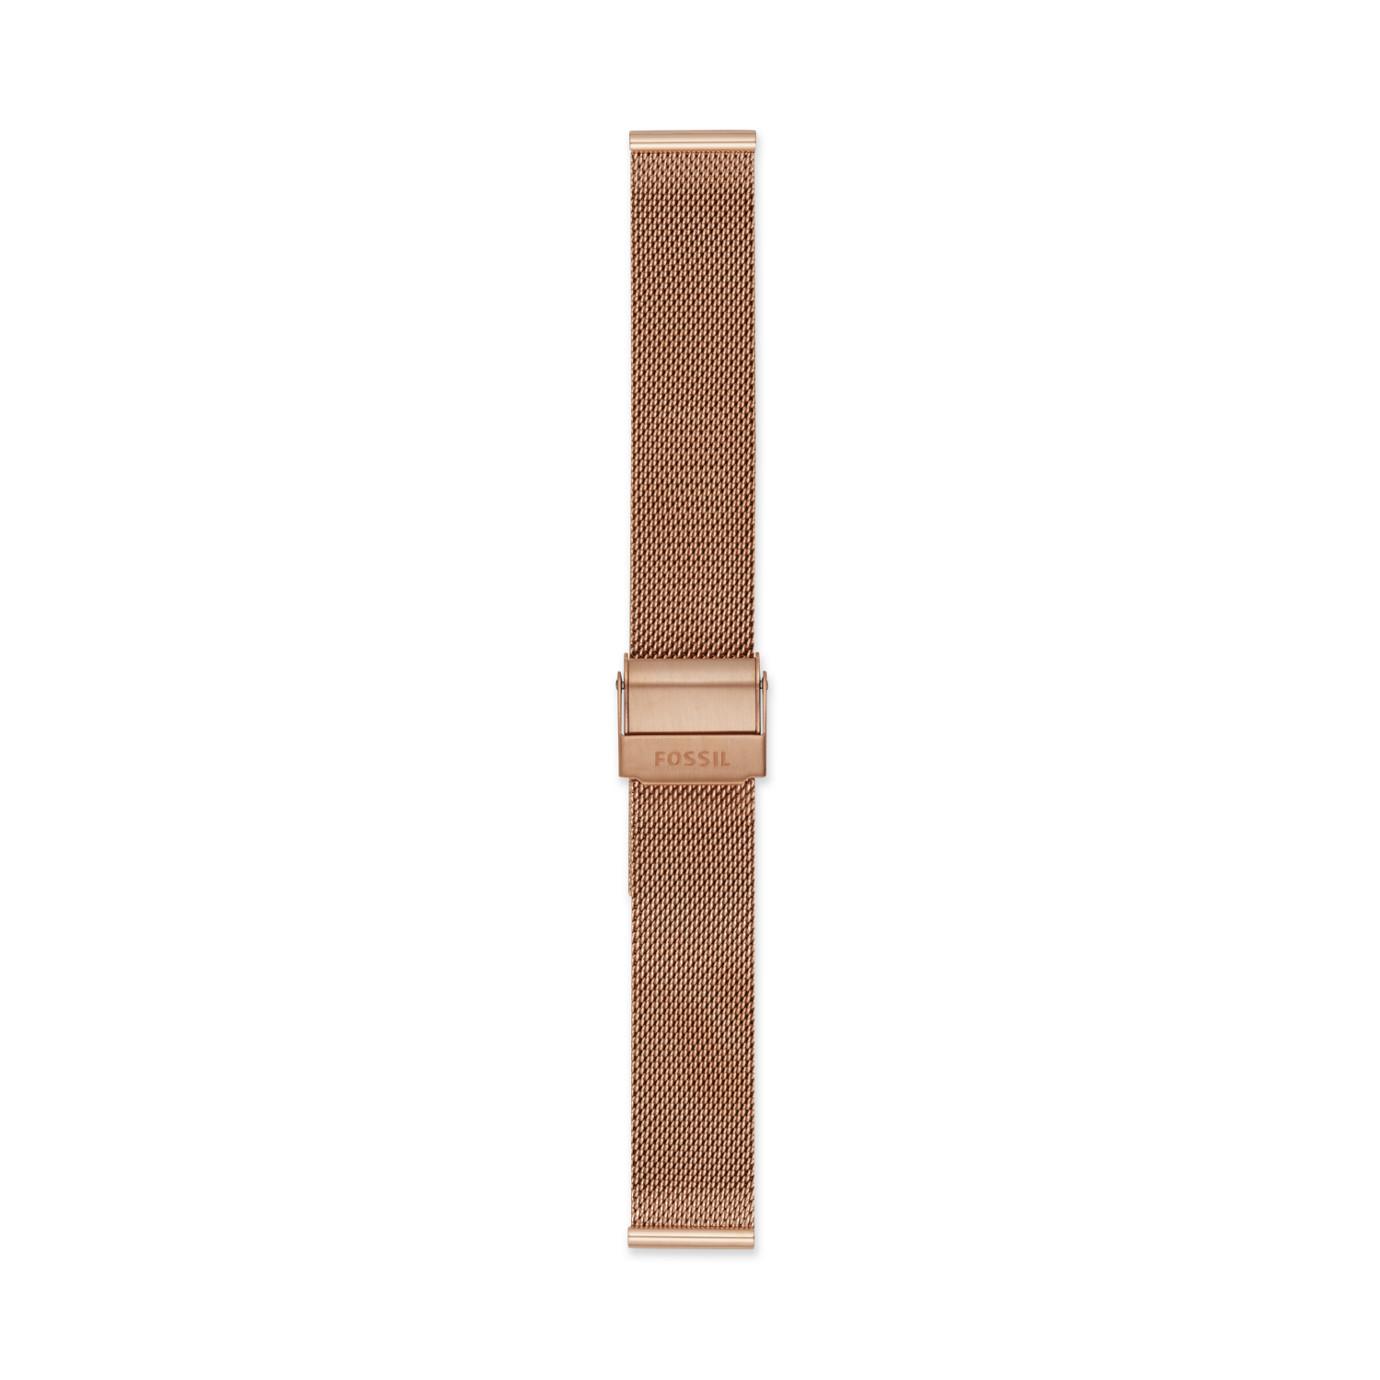 16mm Rose Gold-Tone Steel Mesh Bracelet